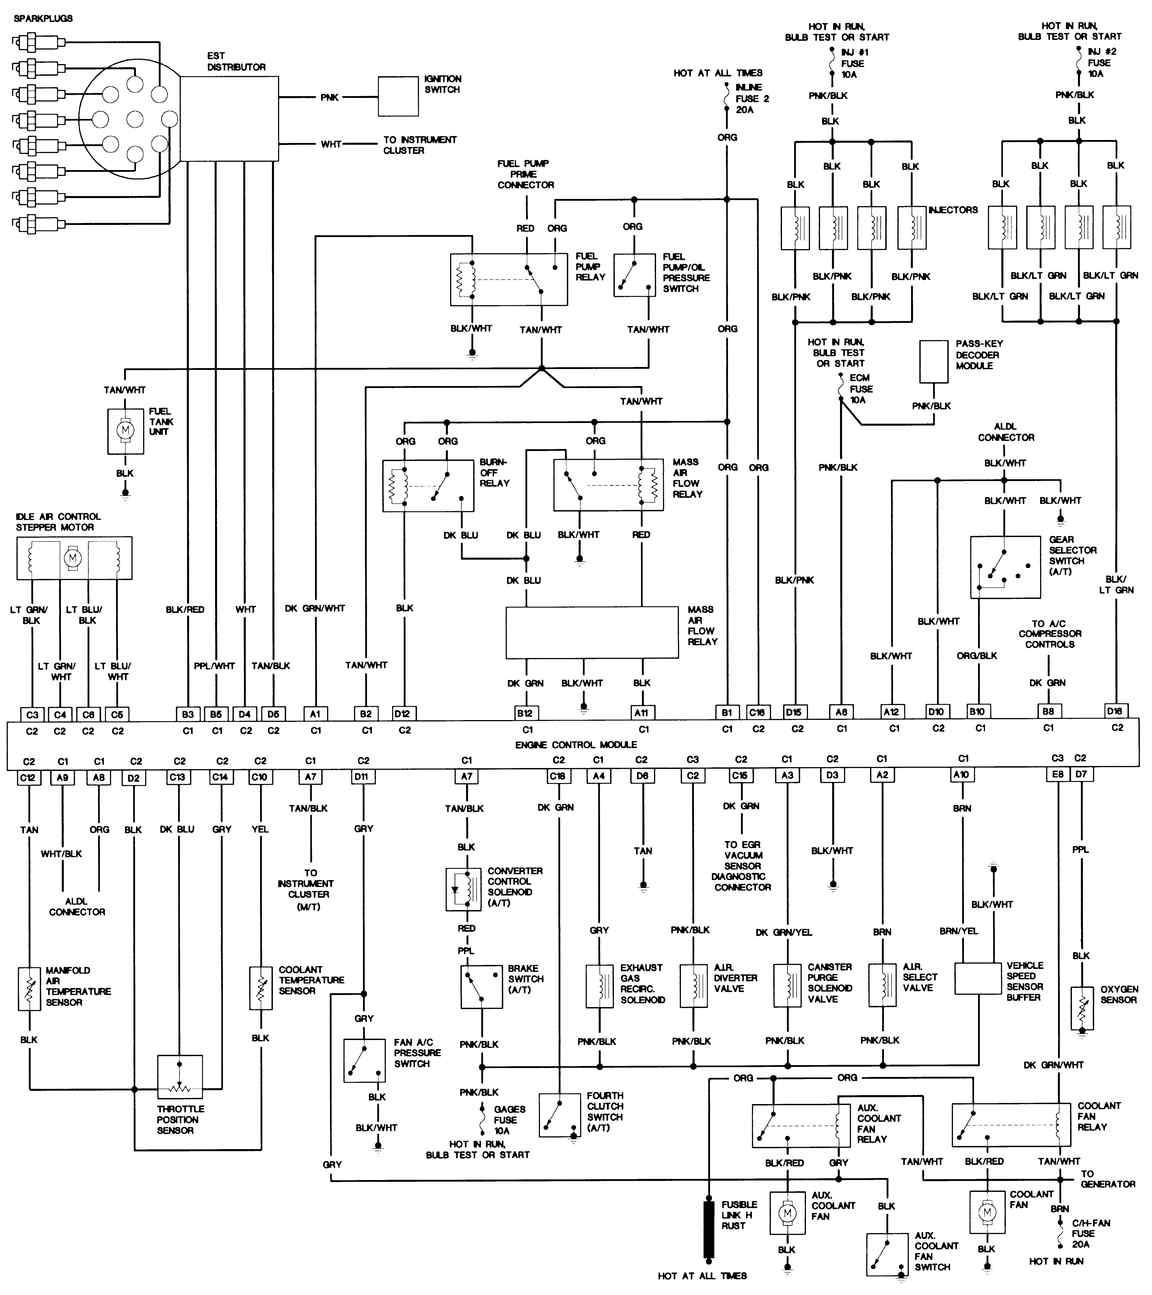 turbo trans am wiring diagram